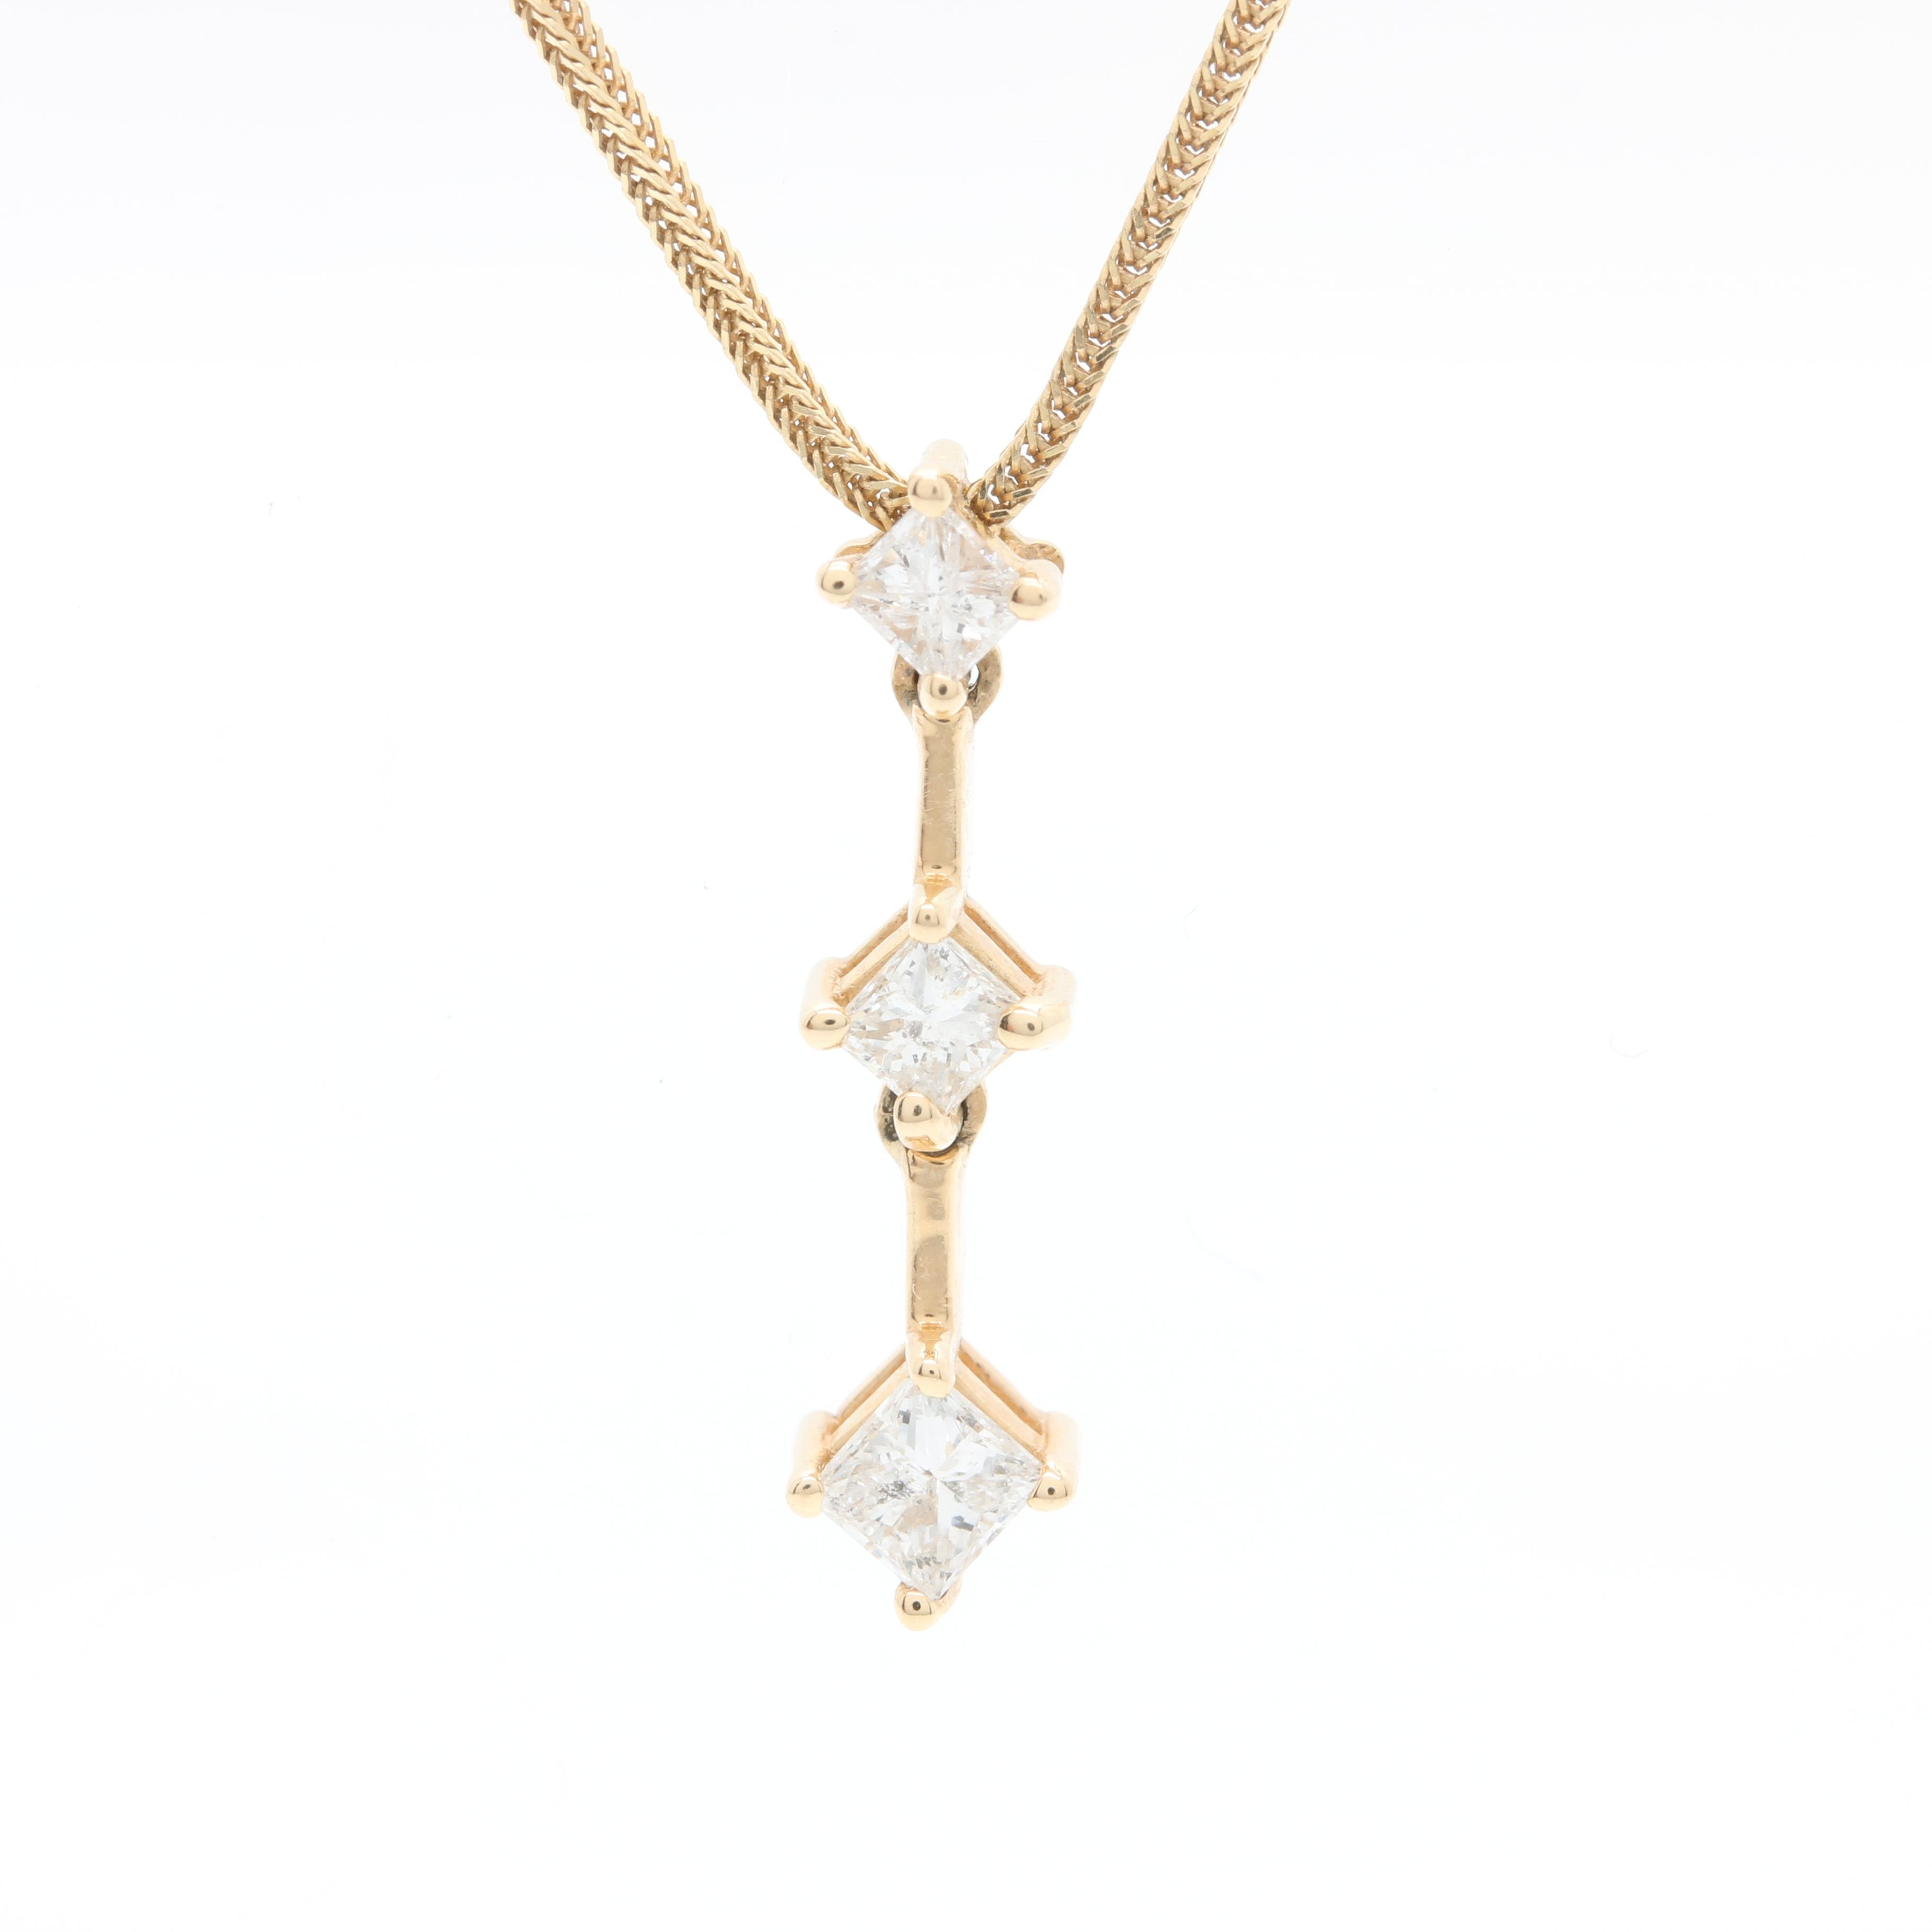 14K Yellow Gold Diamond Drop Pendant Necklace